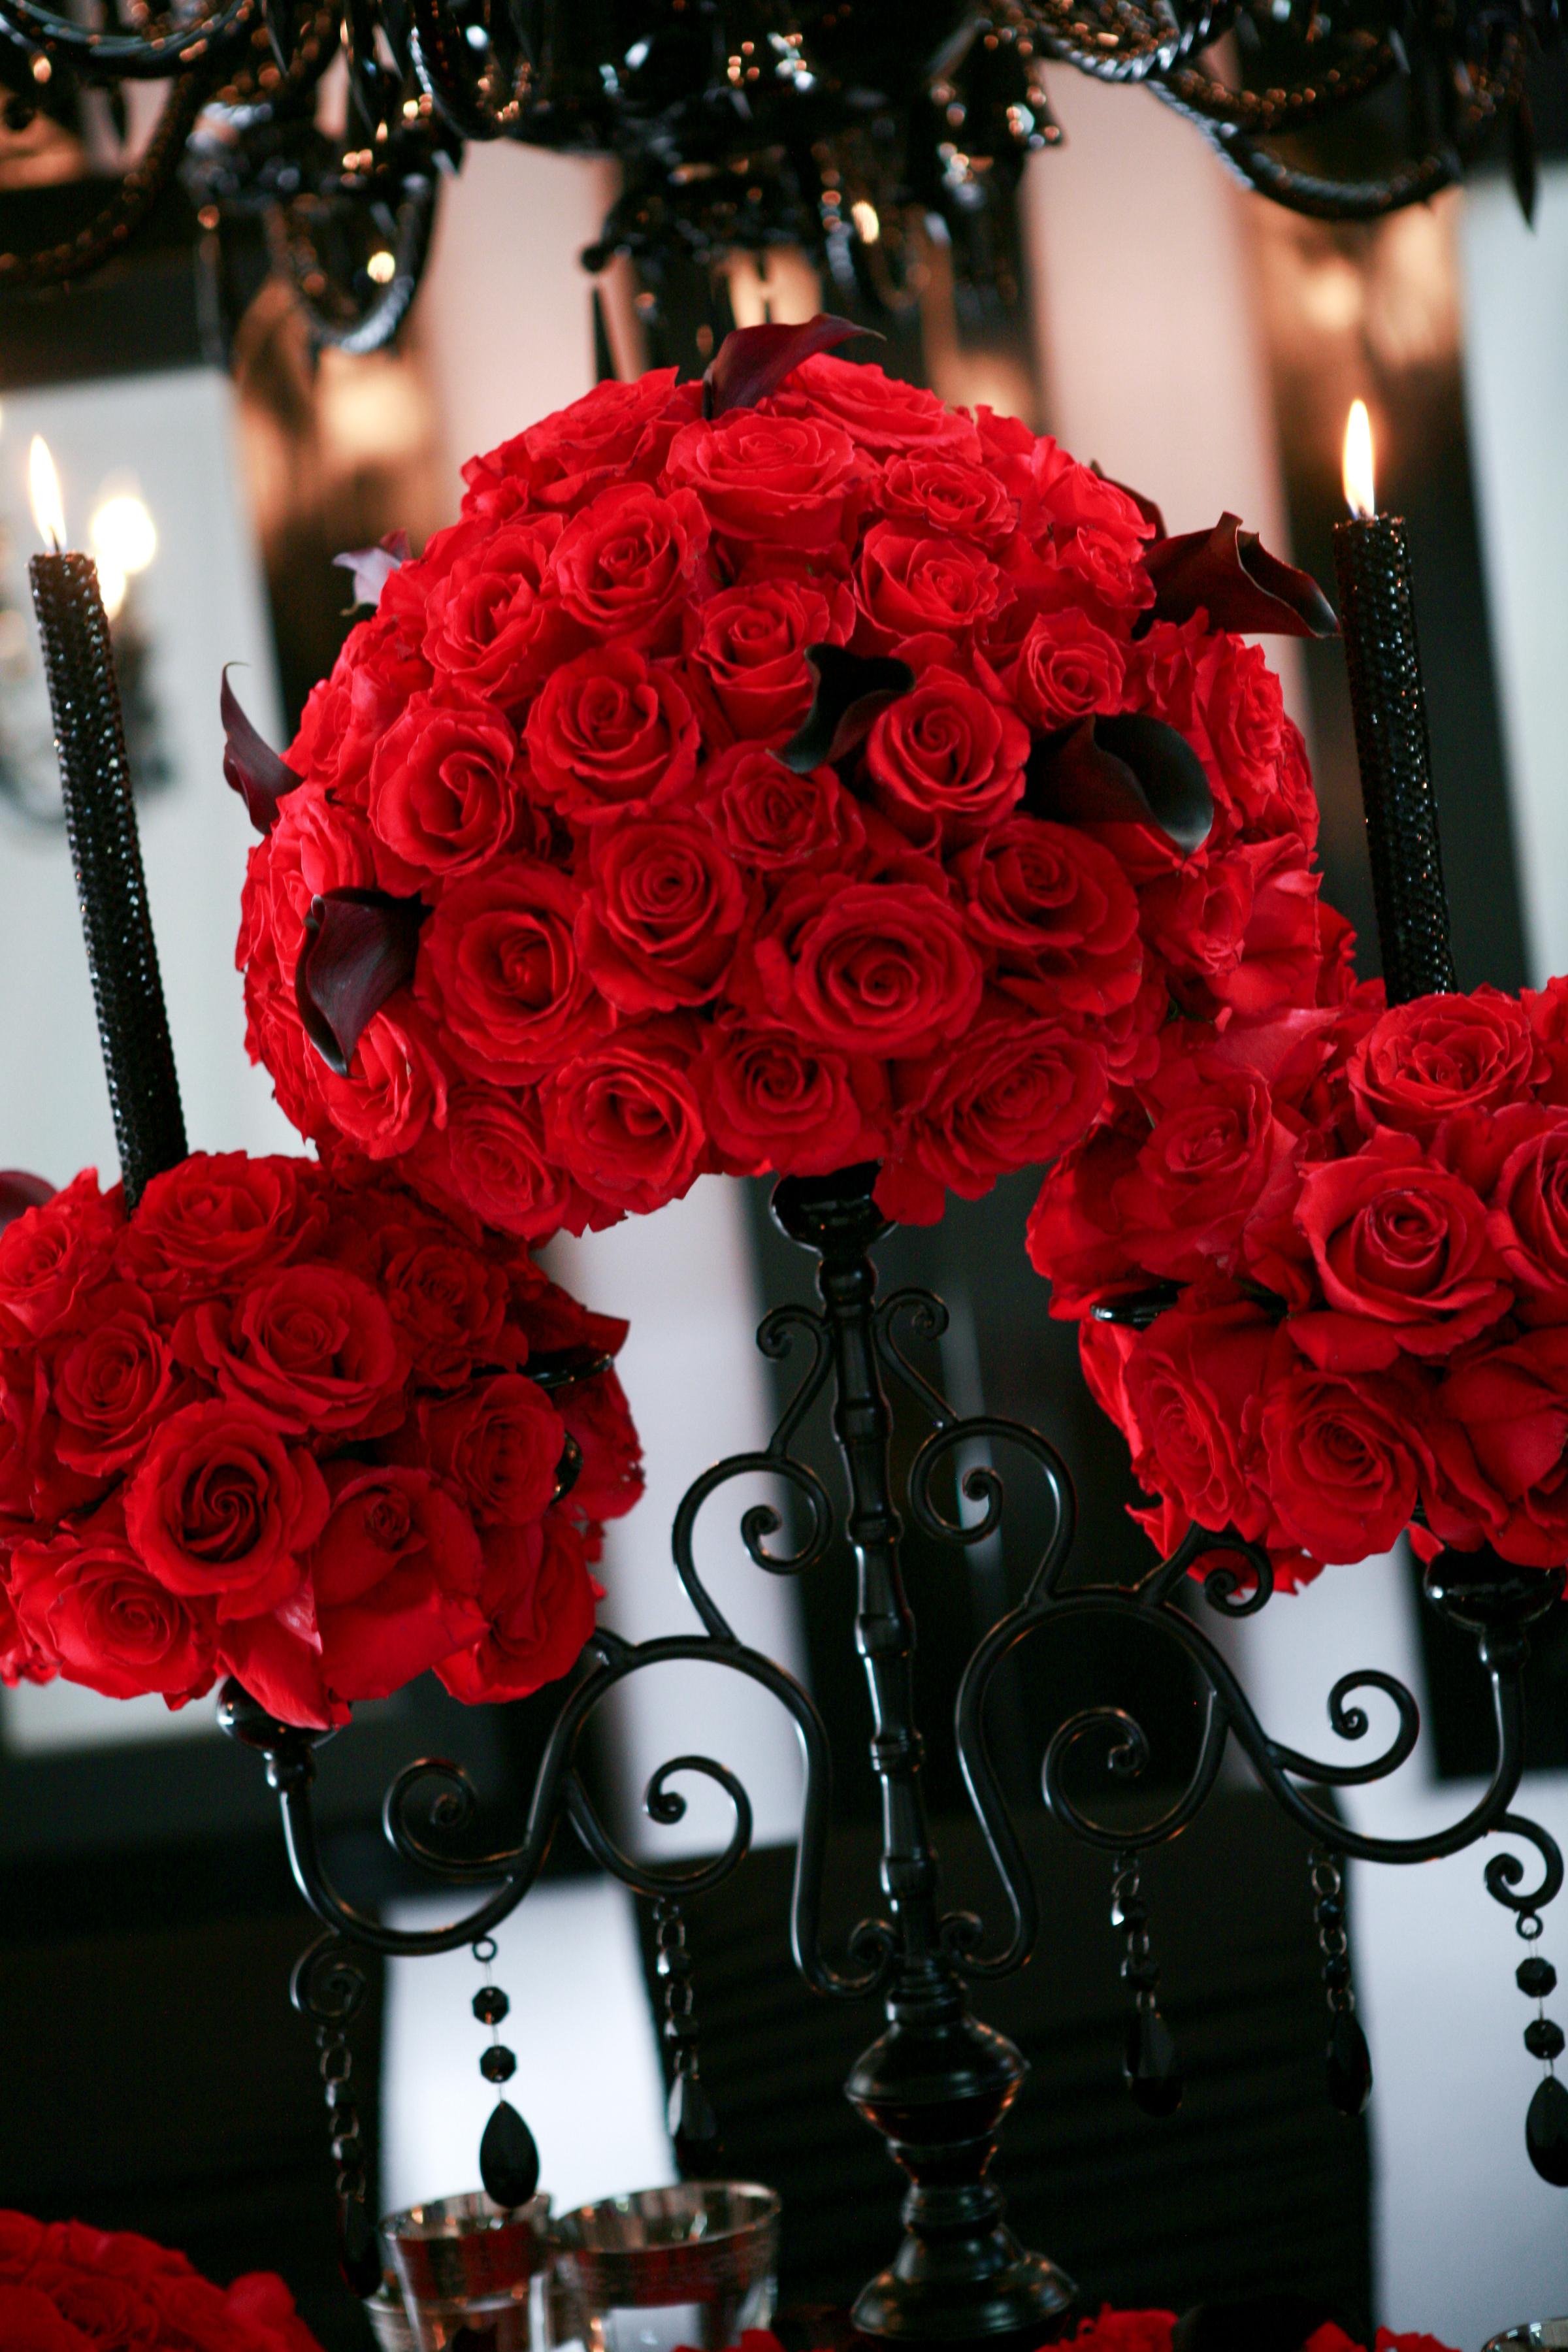 pink, black, Roses, Linens, Hot, Skulls